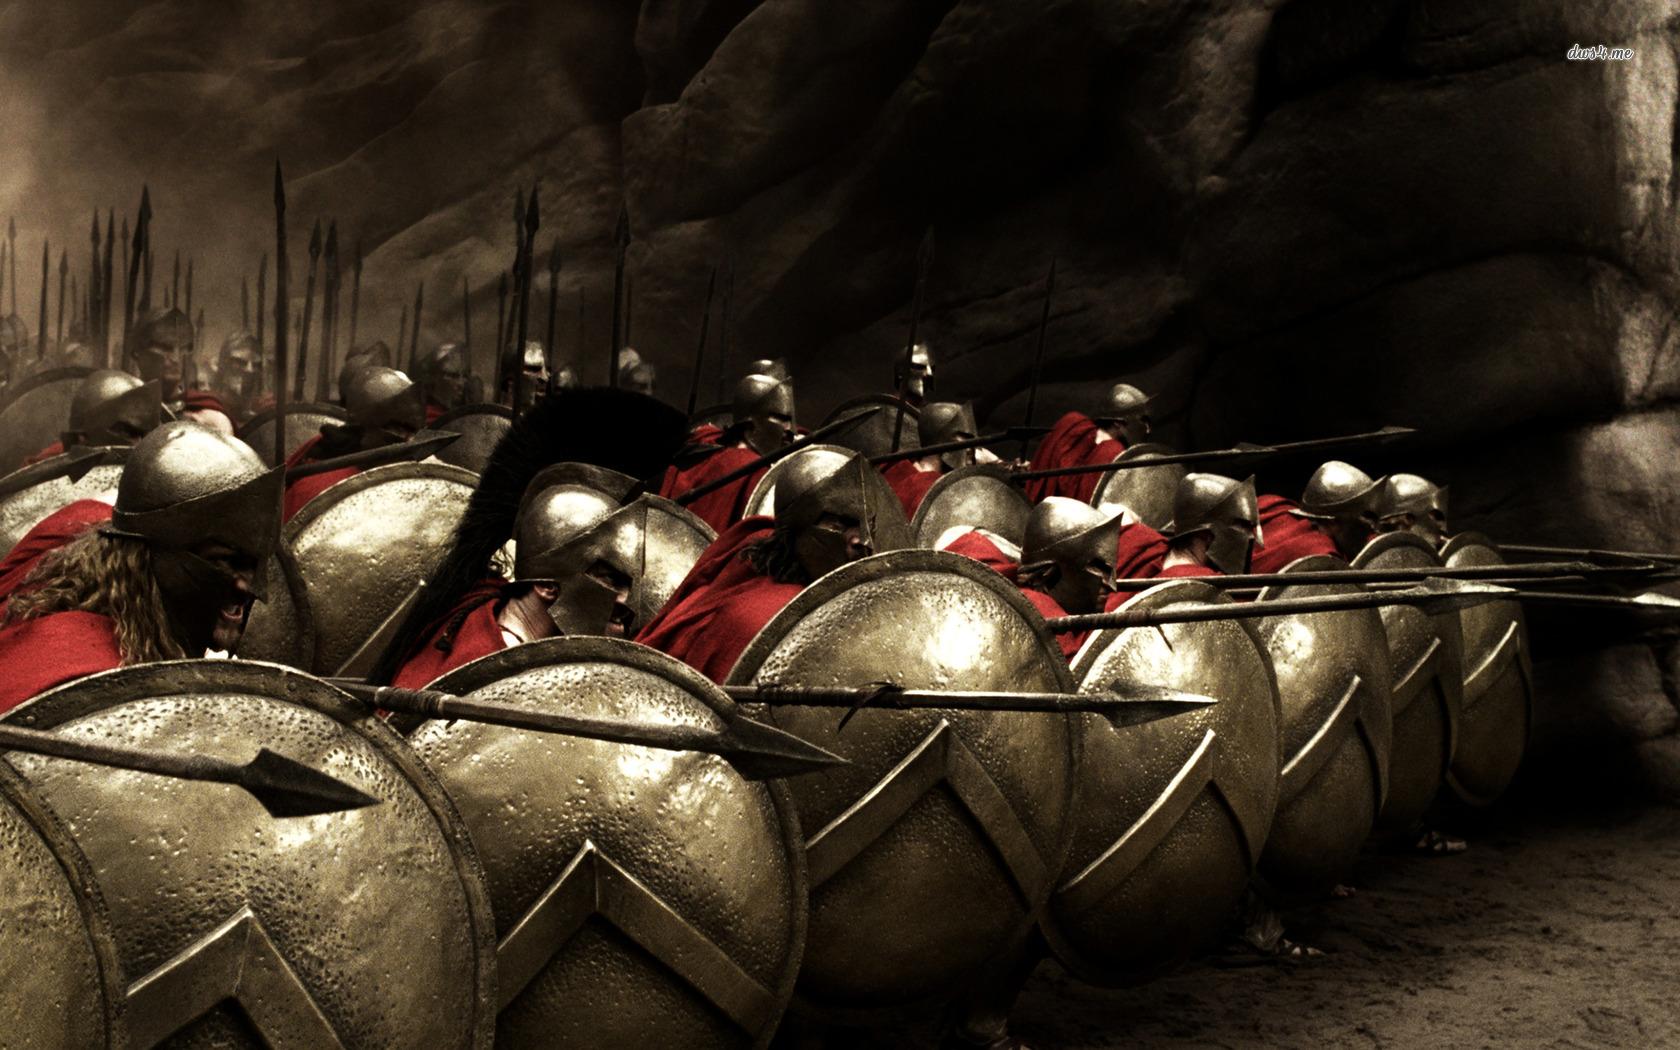 300 spartans 2006 movie download